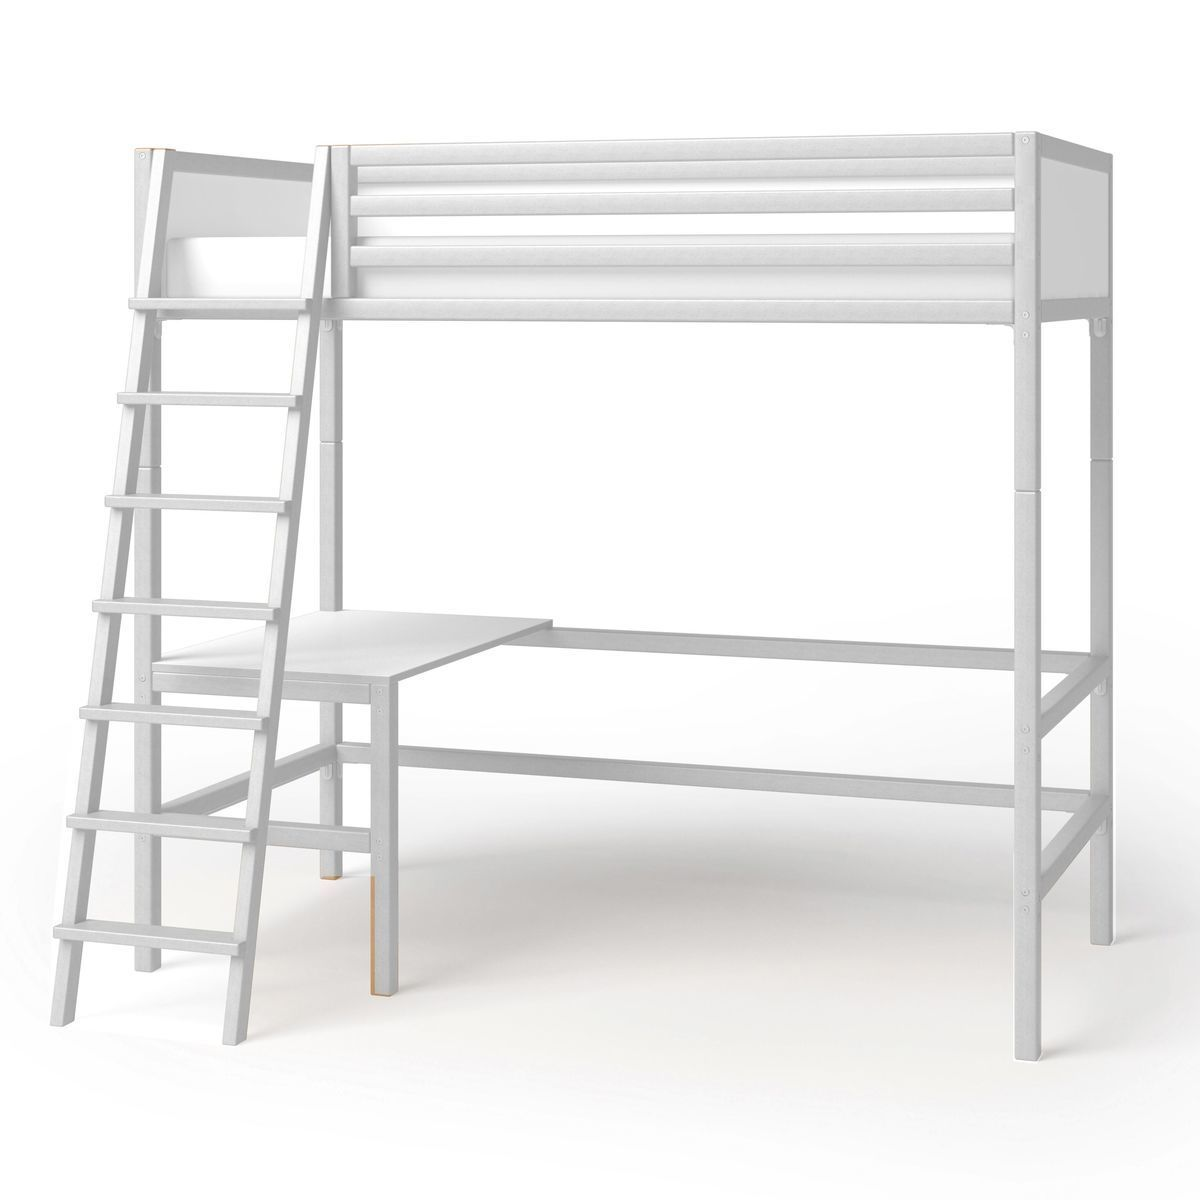 fl totto profilsystem hochbett fl totto. Black Bedroom Furniture Sets. Home Design Ideas